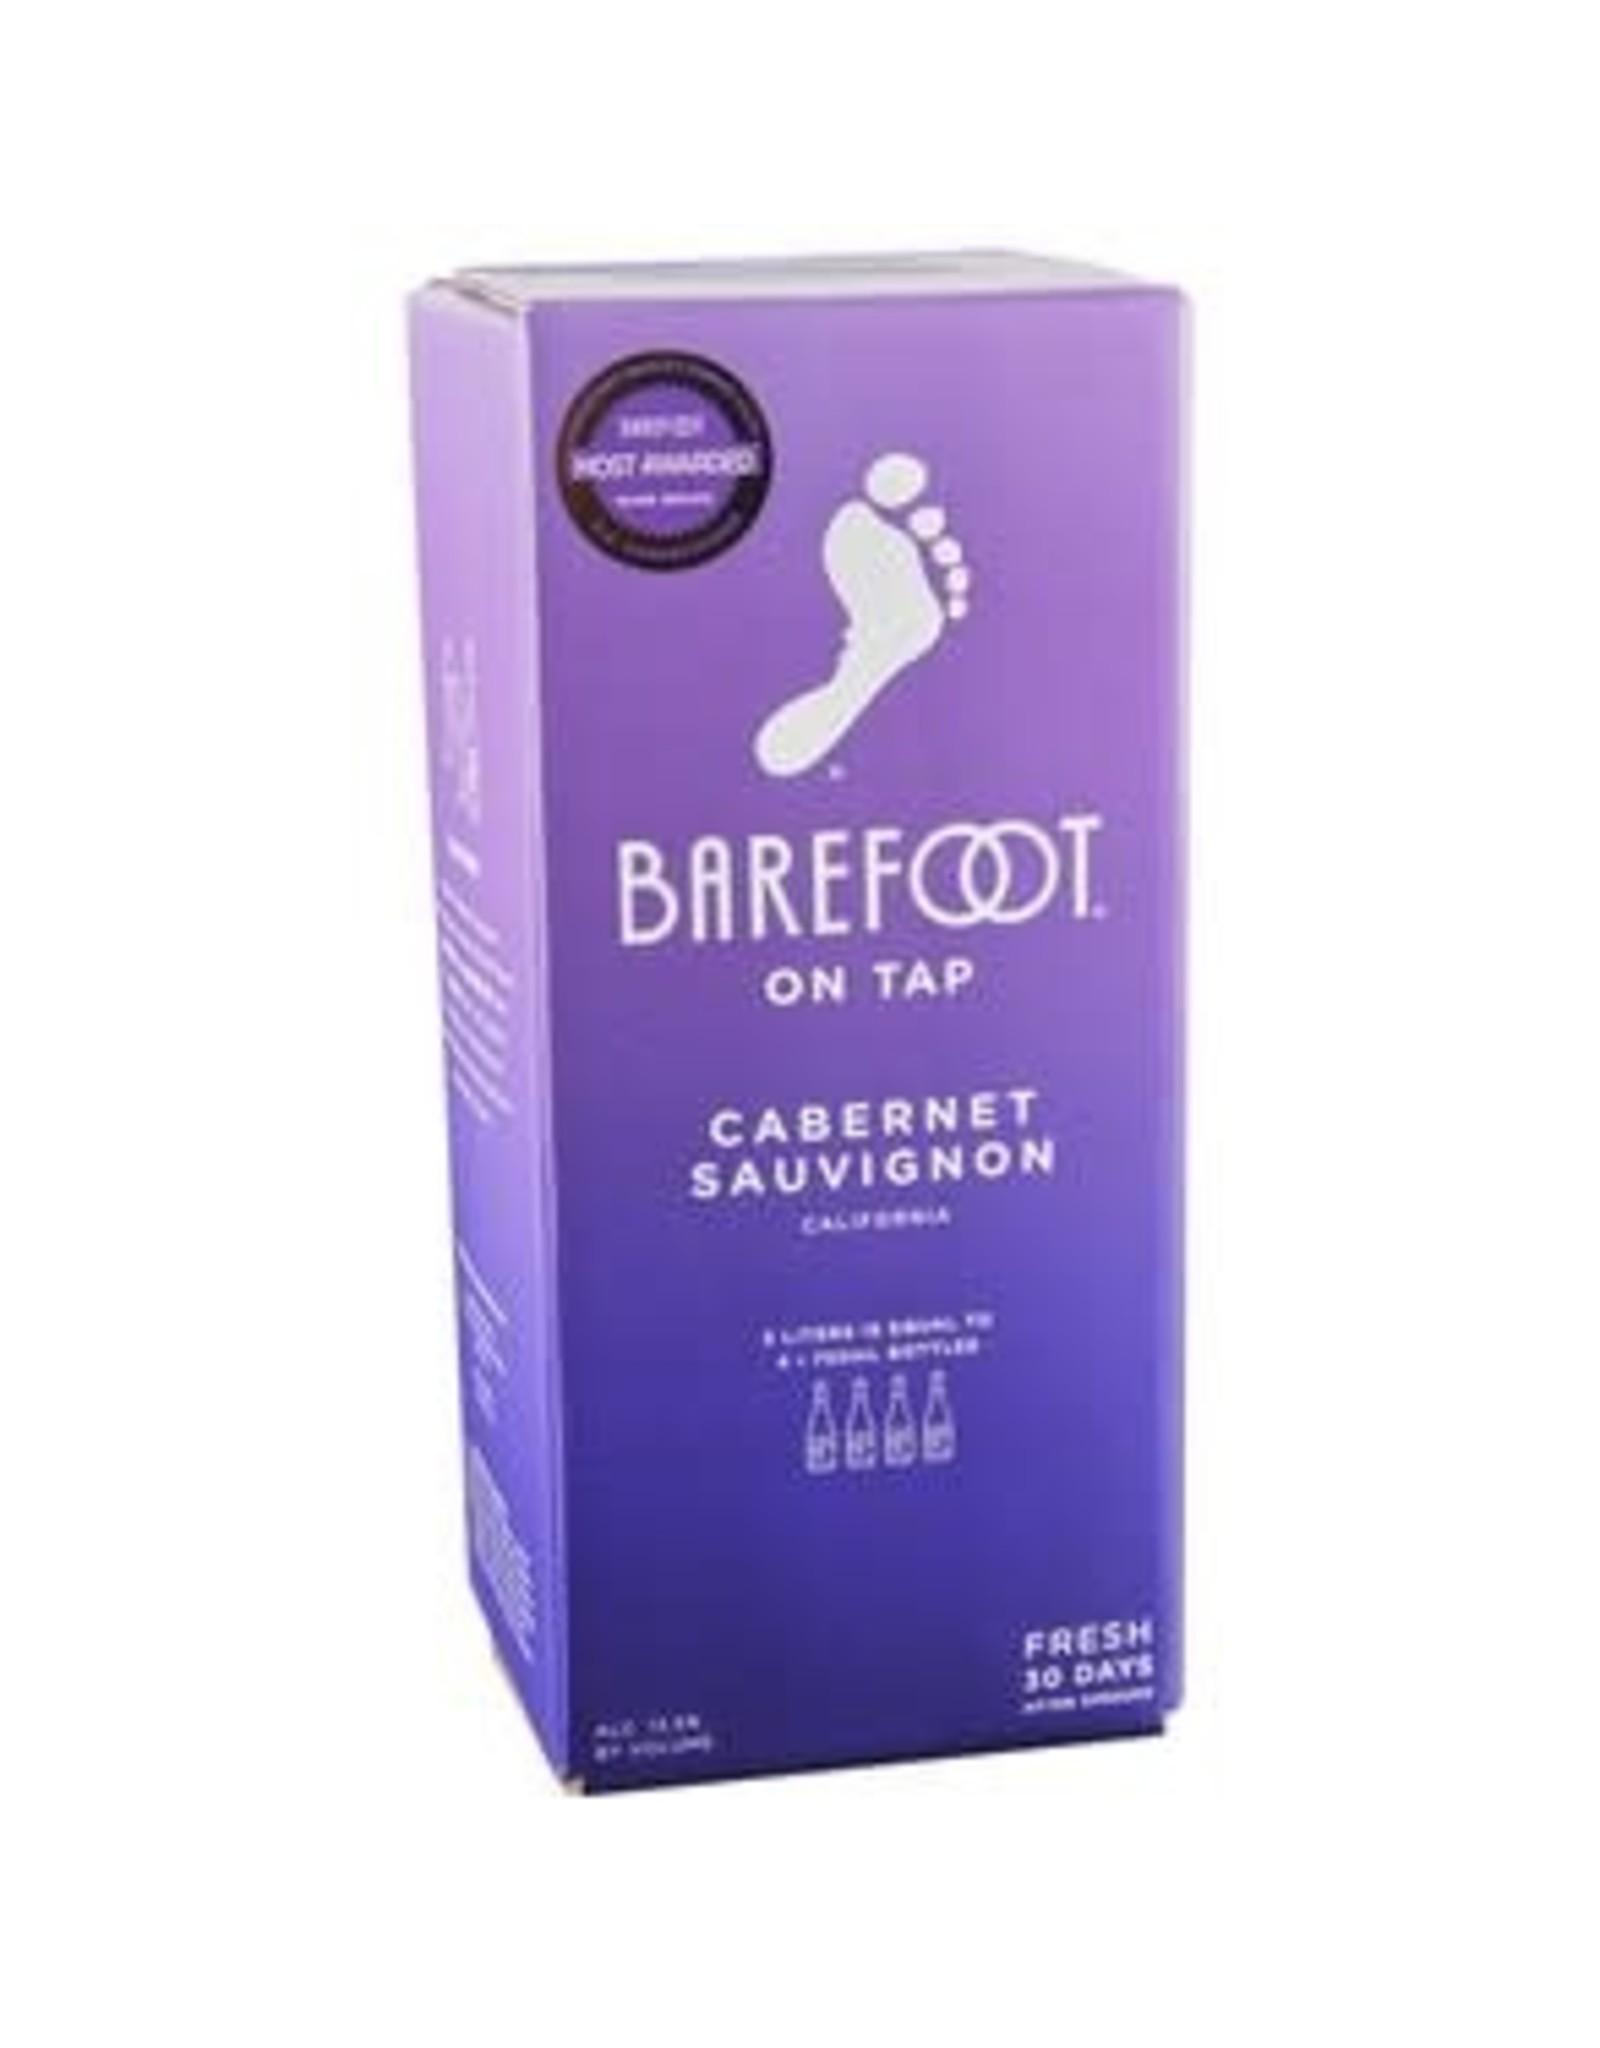 BAREFOOT ON TAP CABERNET SAUVIGNON 3L